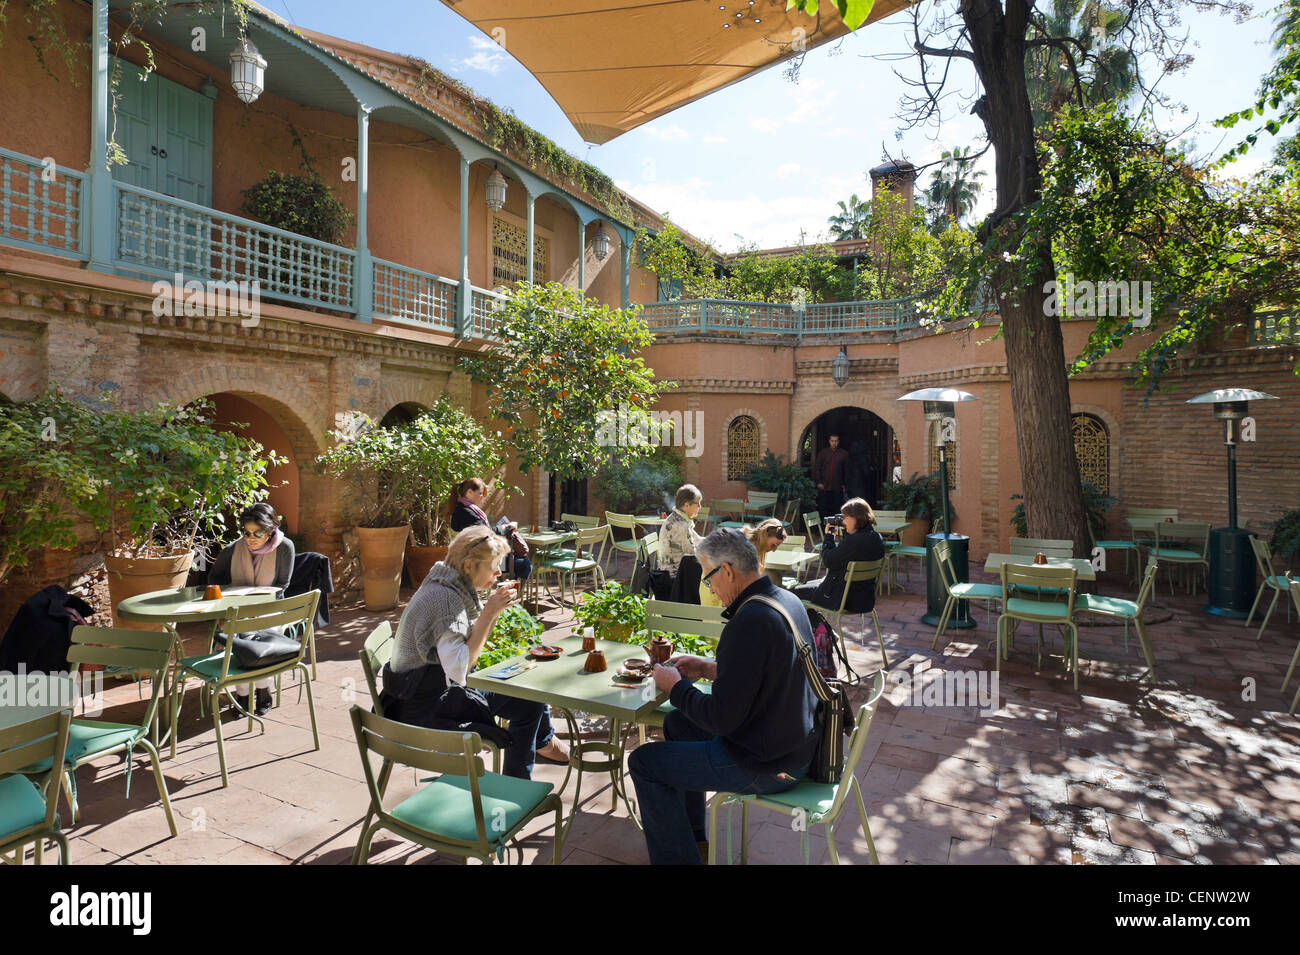 Terrace of the cafe in the Jardin Majorelle ( Majorelle Garden ), Marrakech, Morocco, North Africa - Stock Image